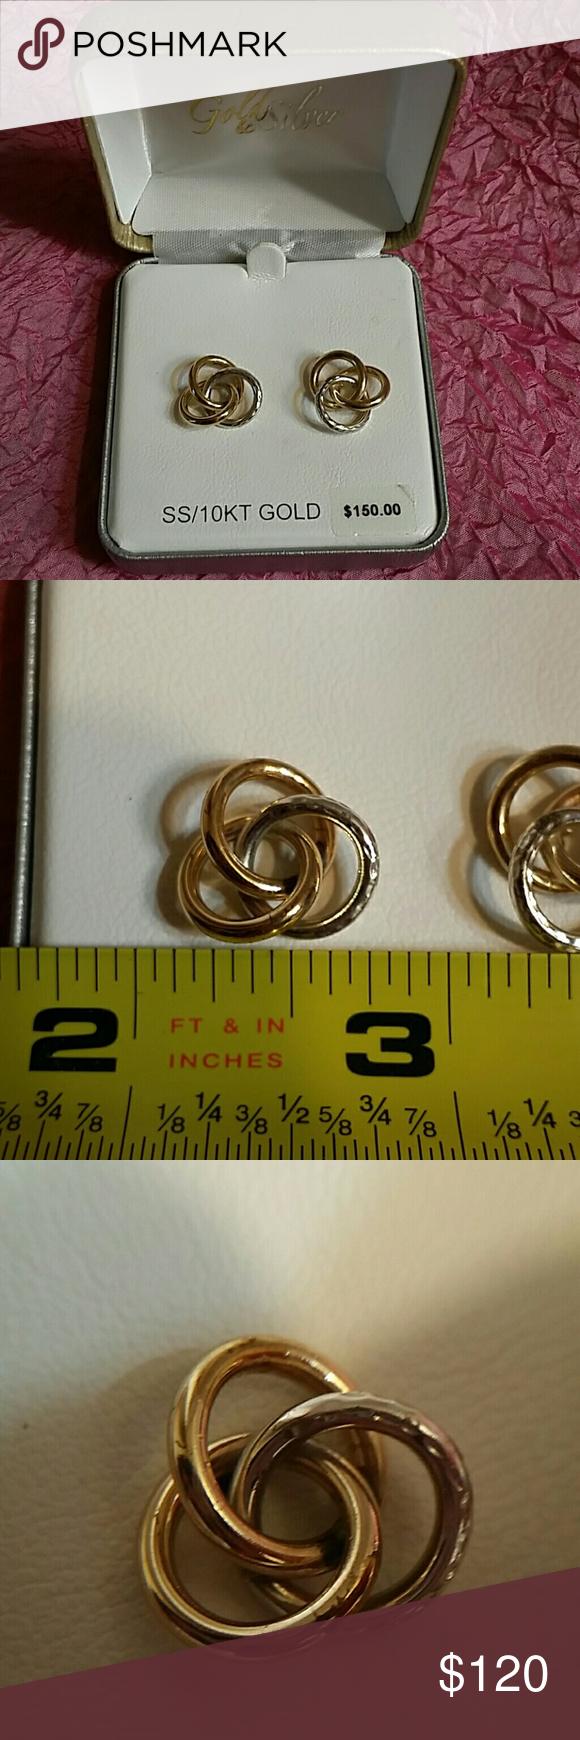 Large 10k 925 Circle Earrings Two Tone Nwt Circle Earrings Large Earrings One Ring